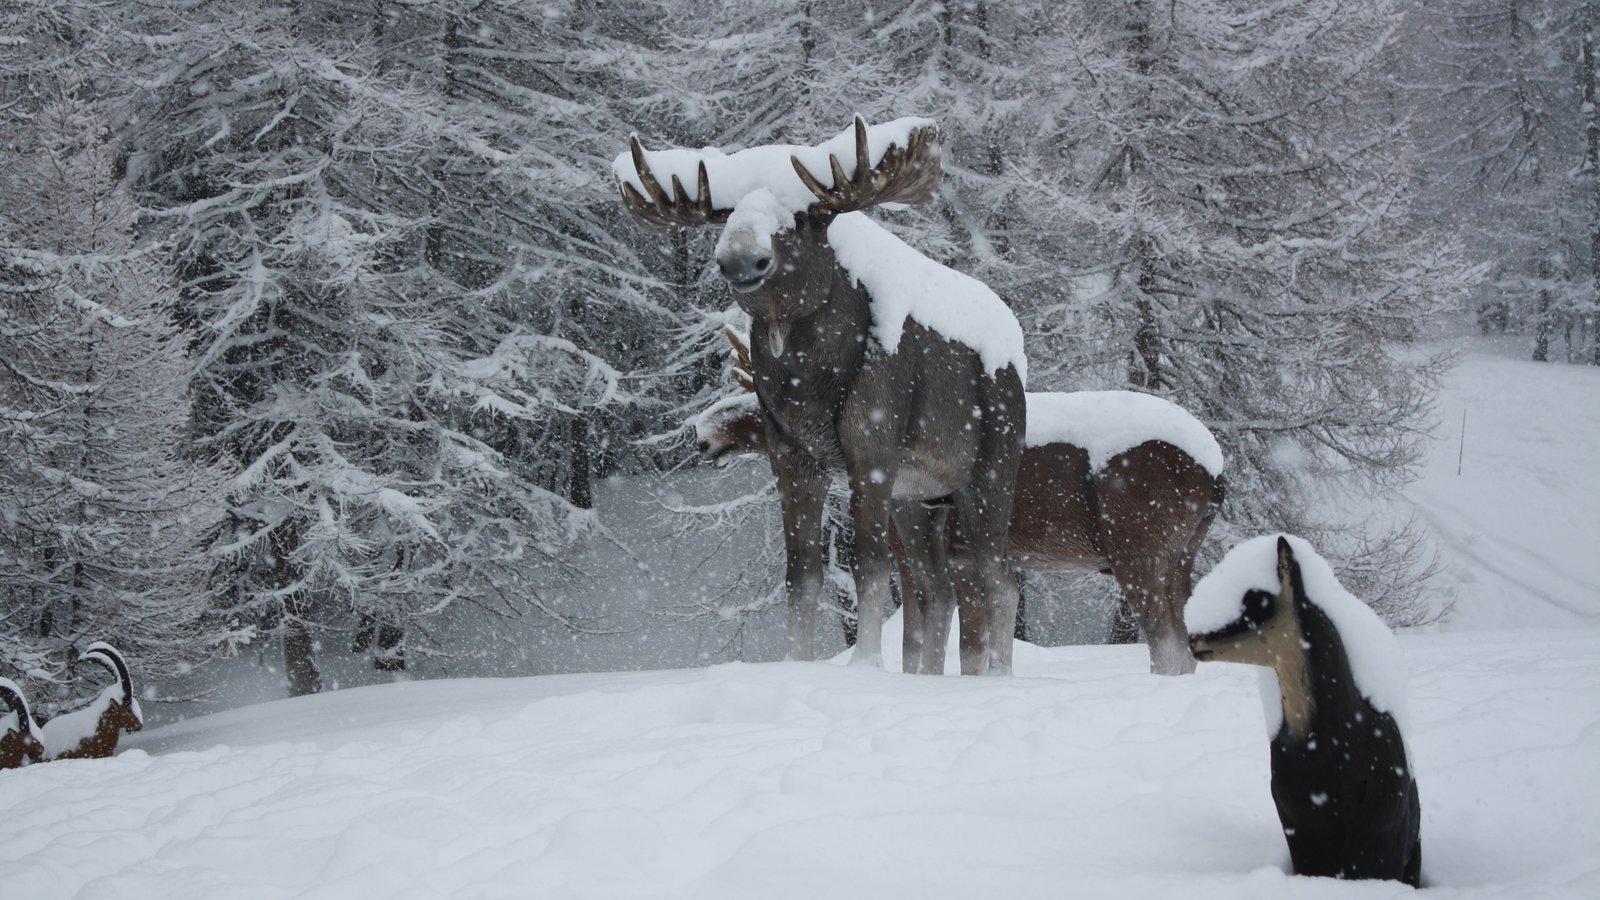 Bardonecchia Ski Resort featuring a statue or sculpture and snow